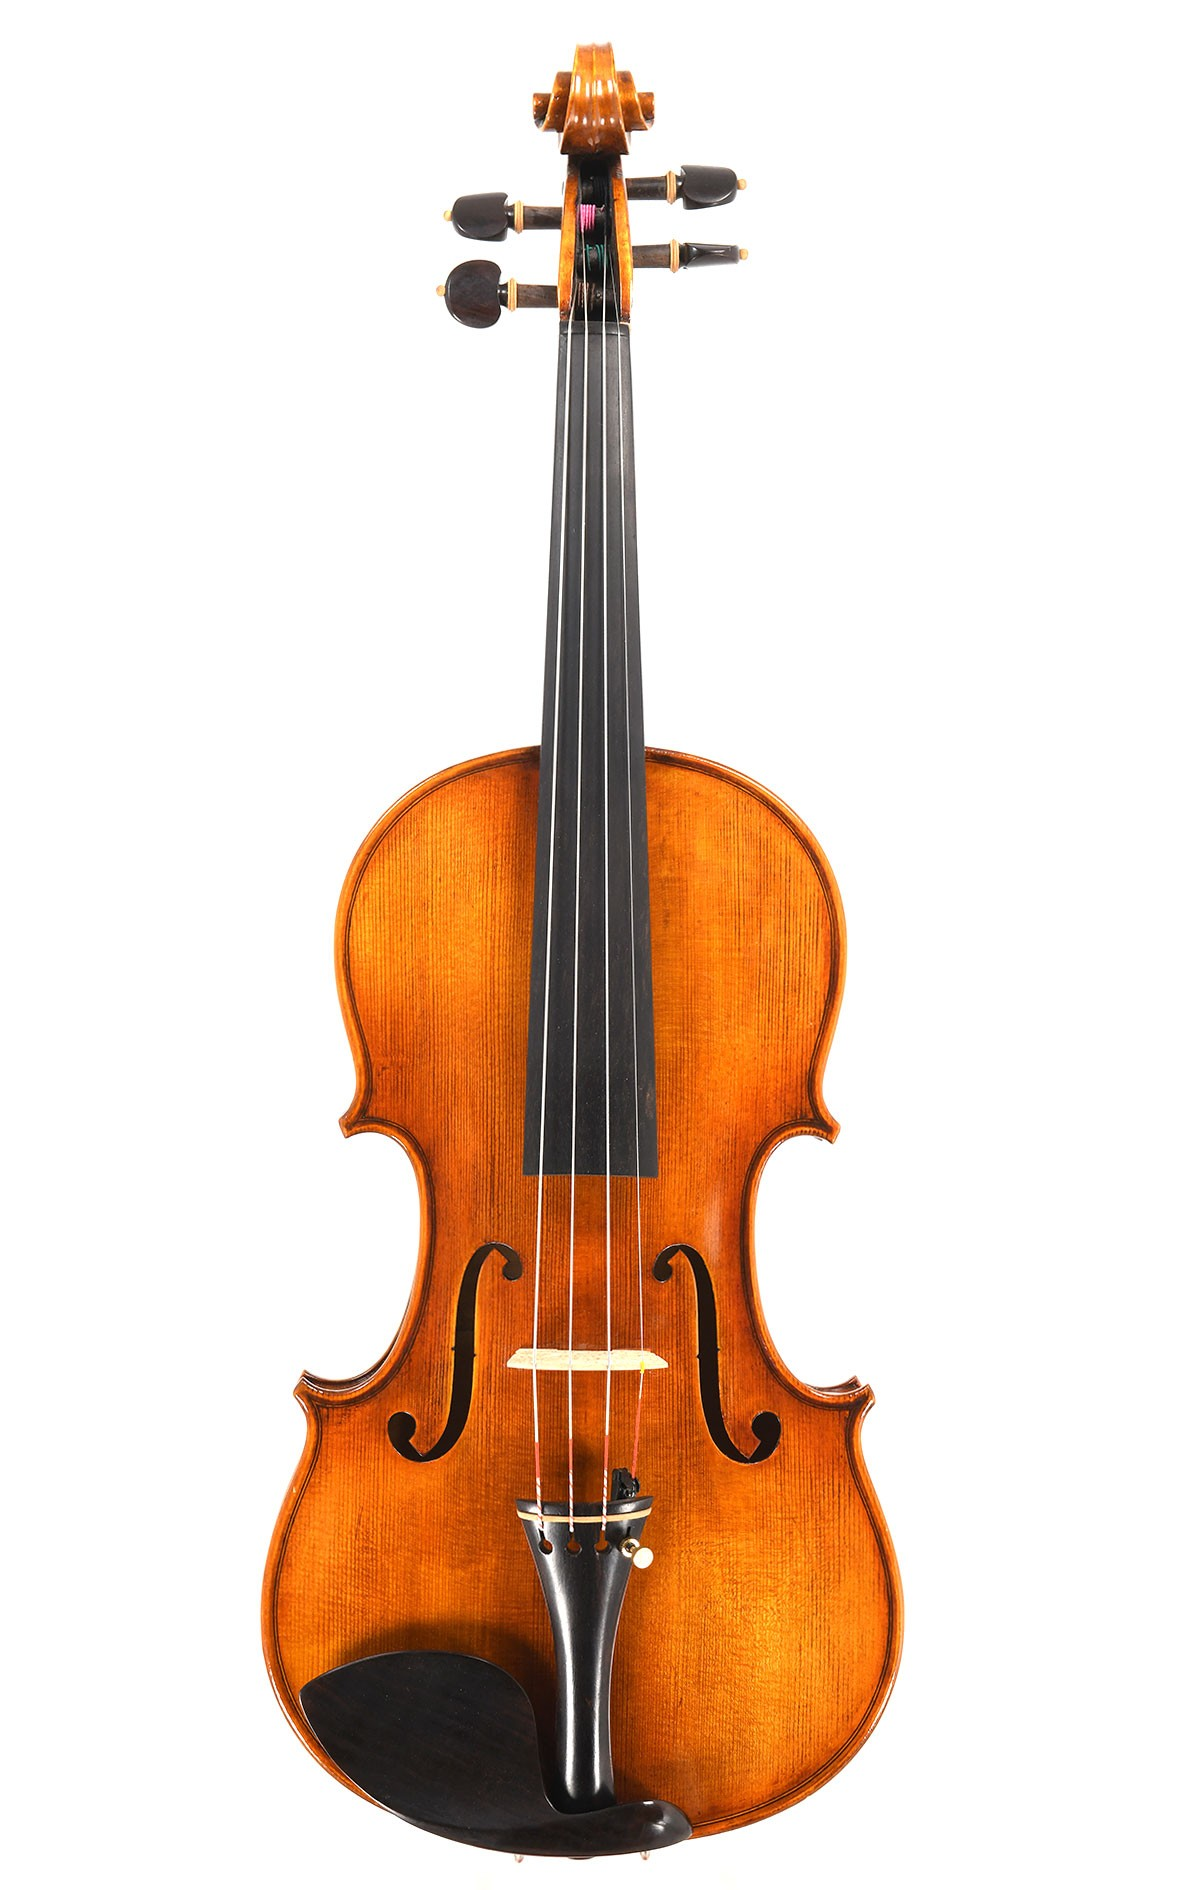 SALE Violin - after Stradivarius